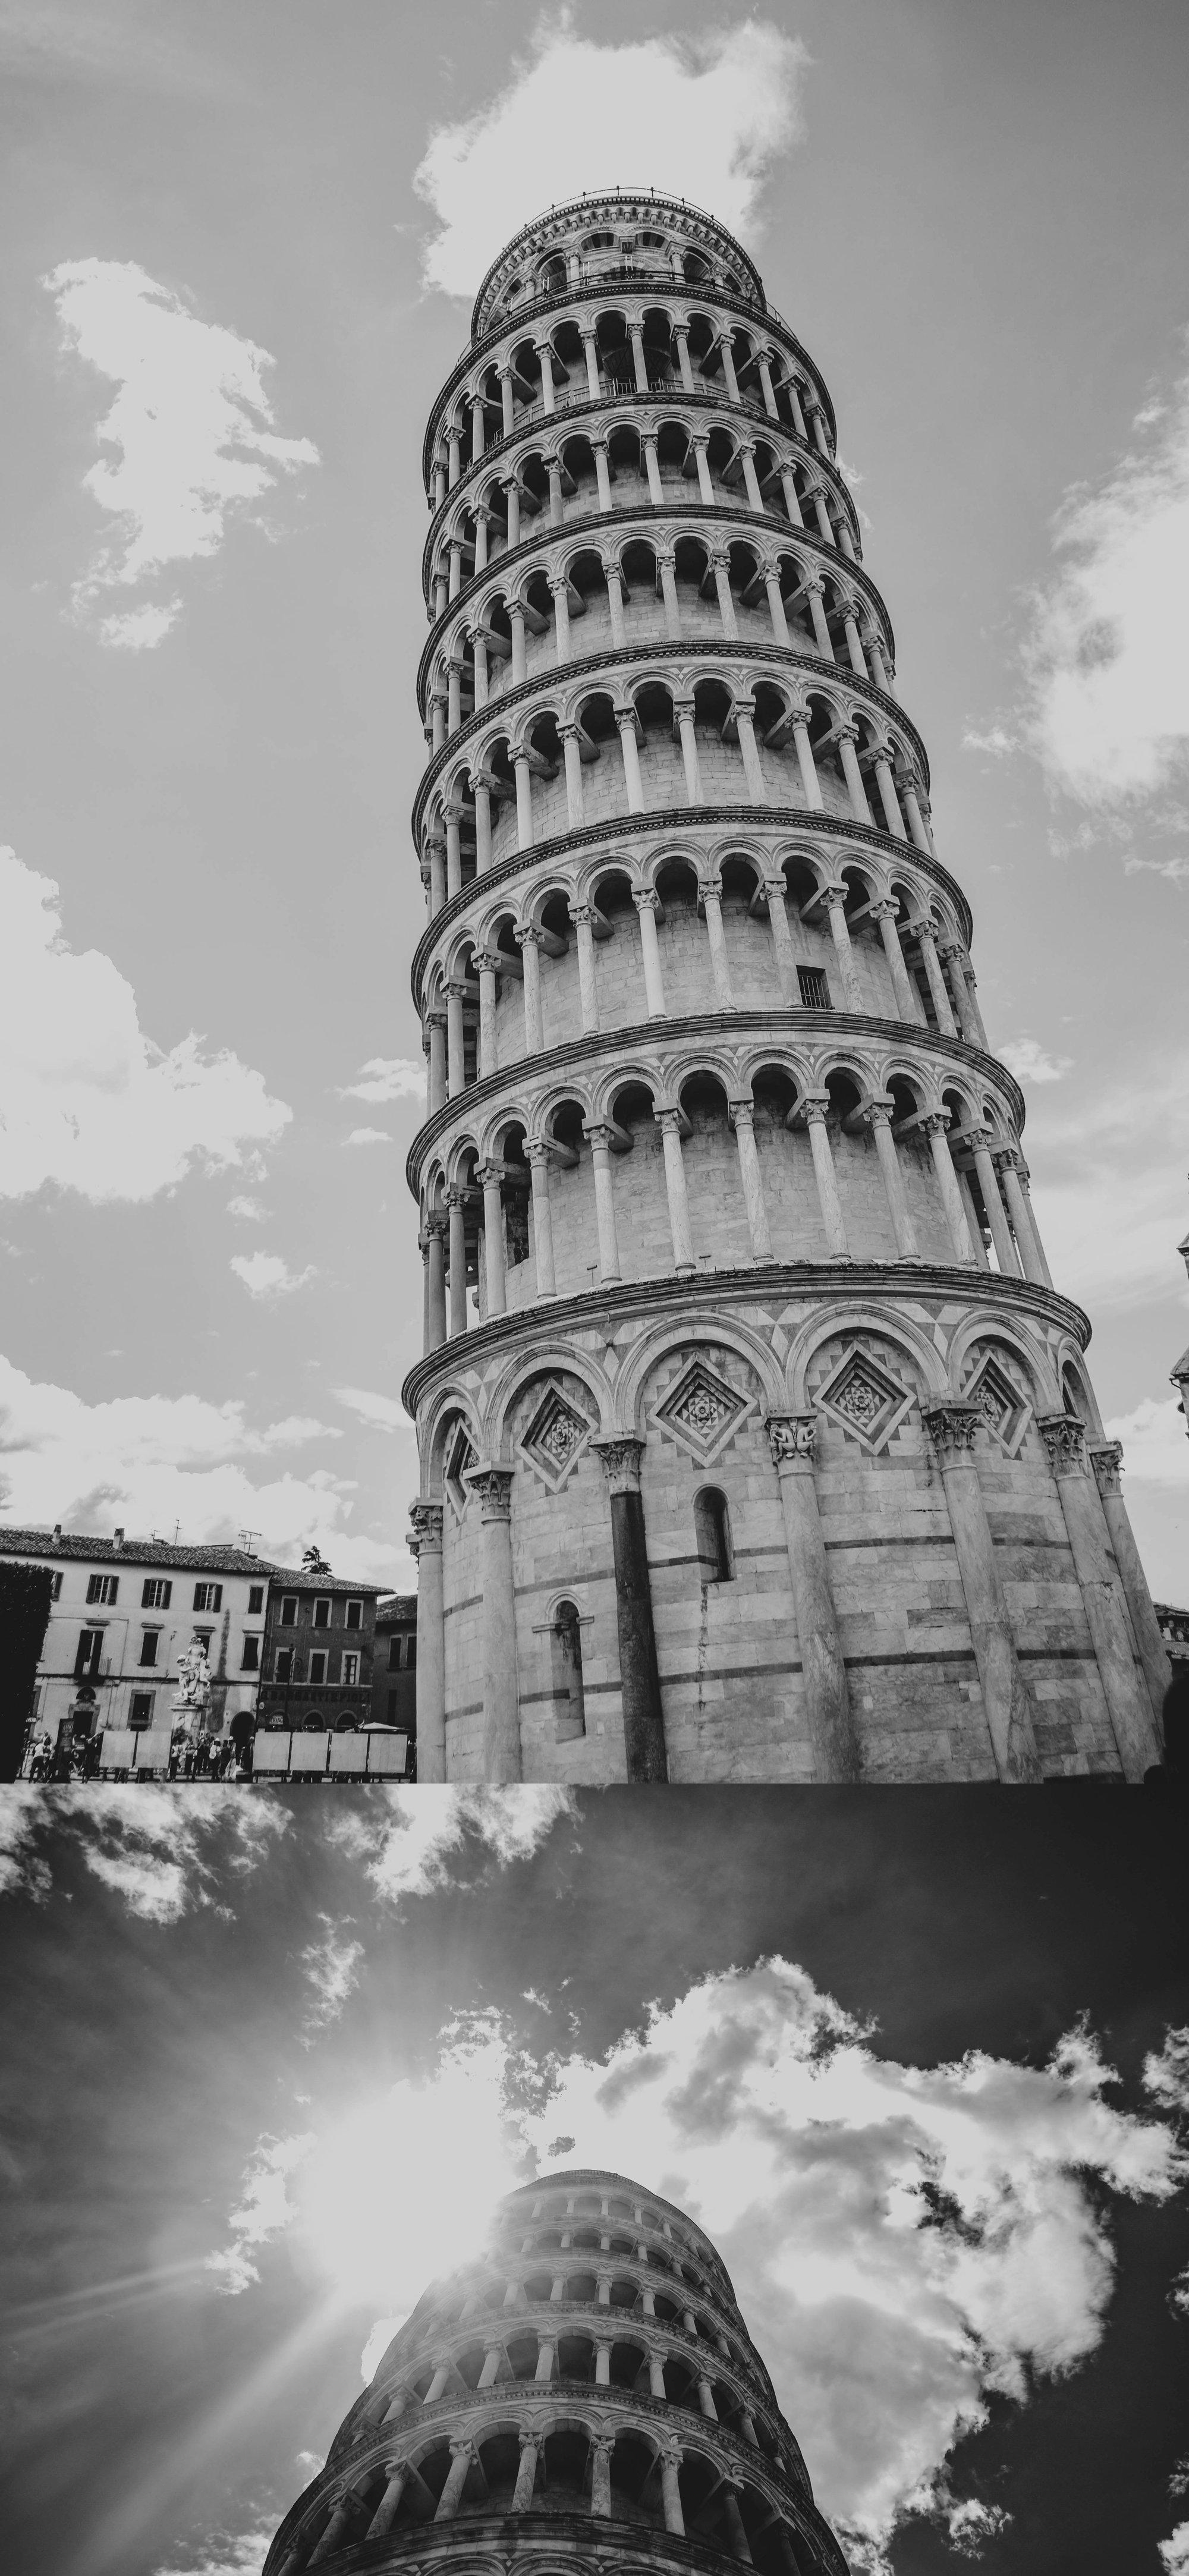 Leaning Tower of Pisa Essex Documentary Travel Wedding Photographer